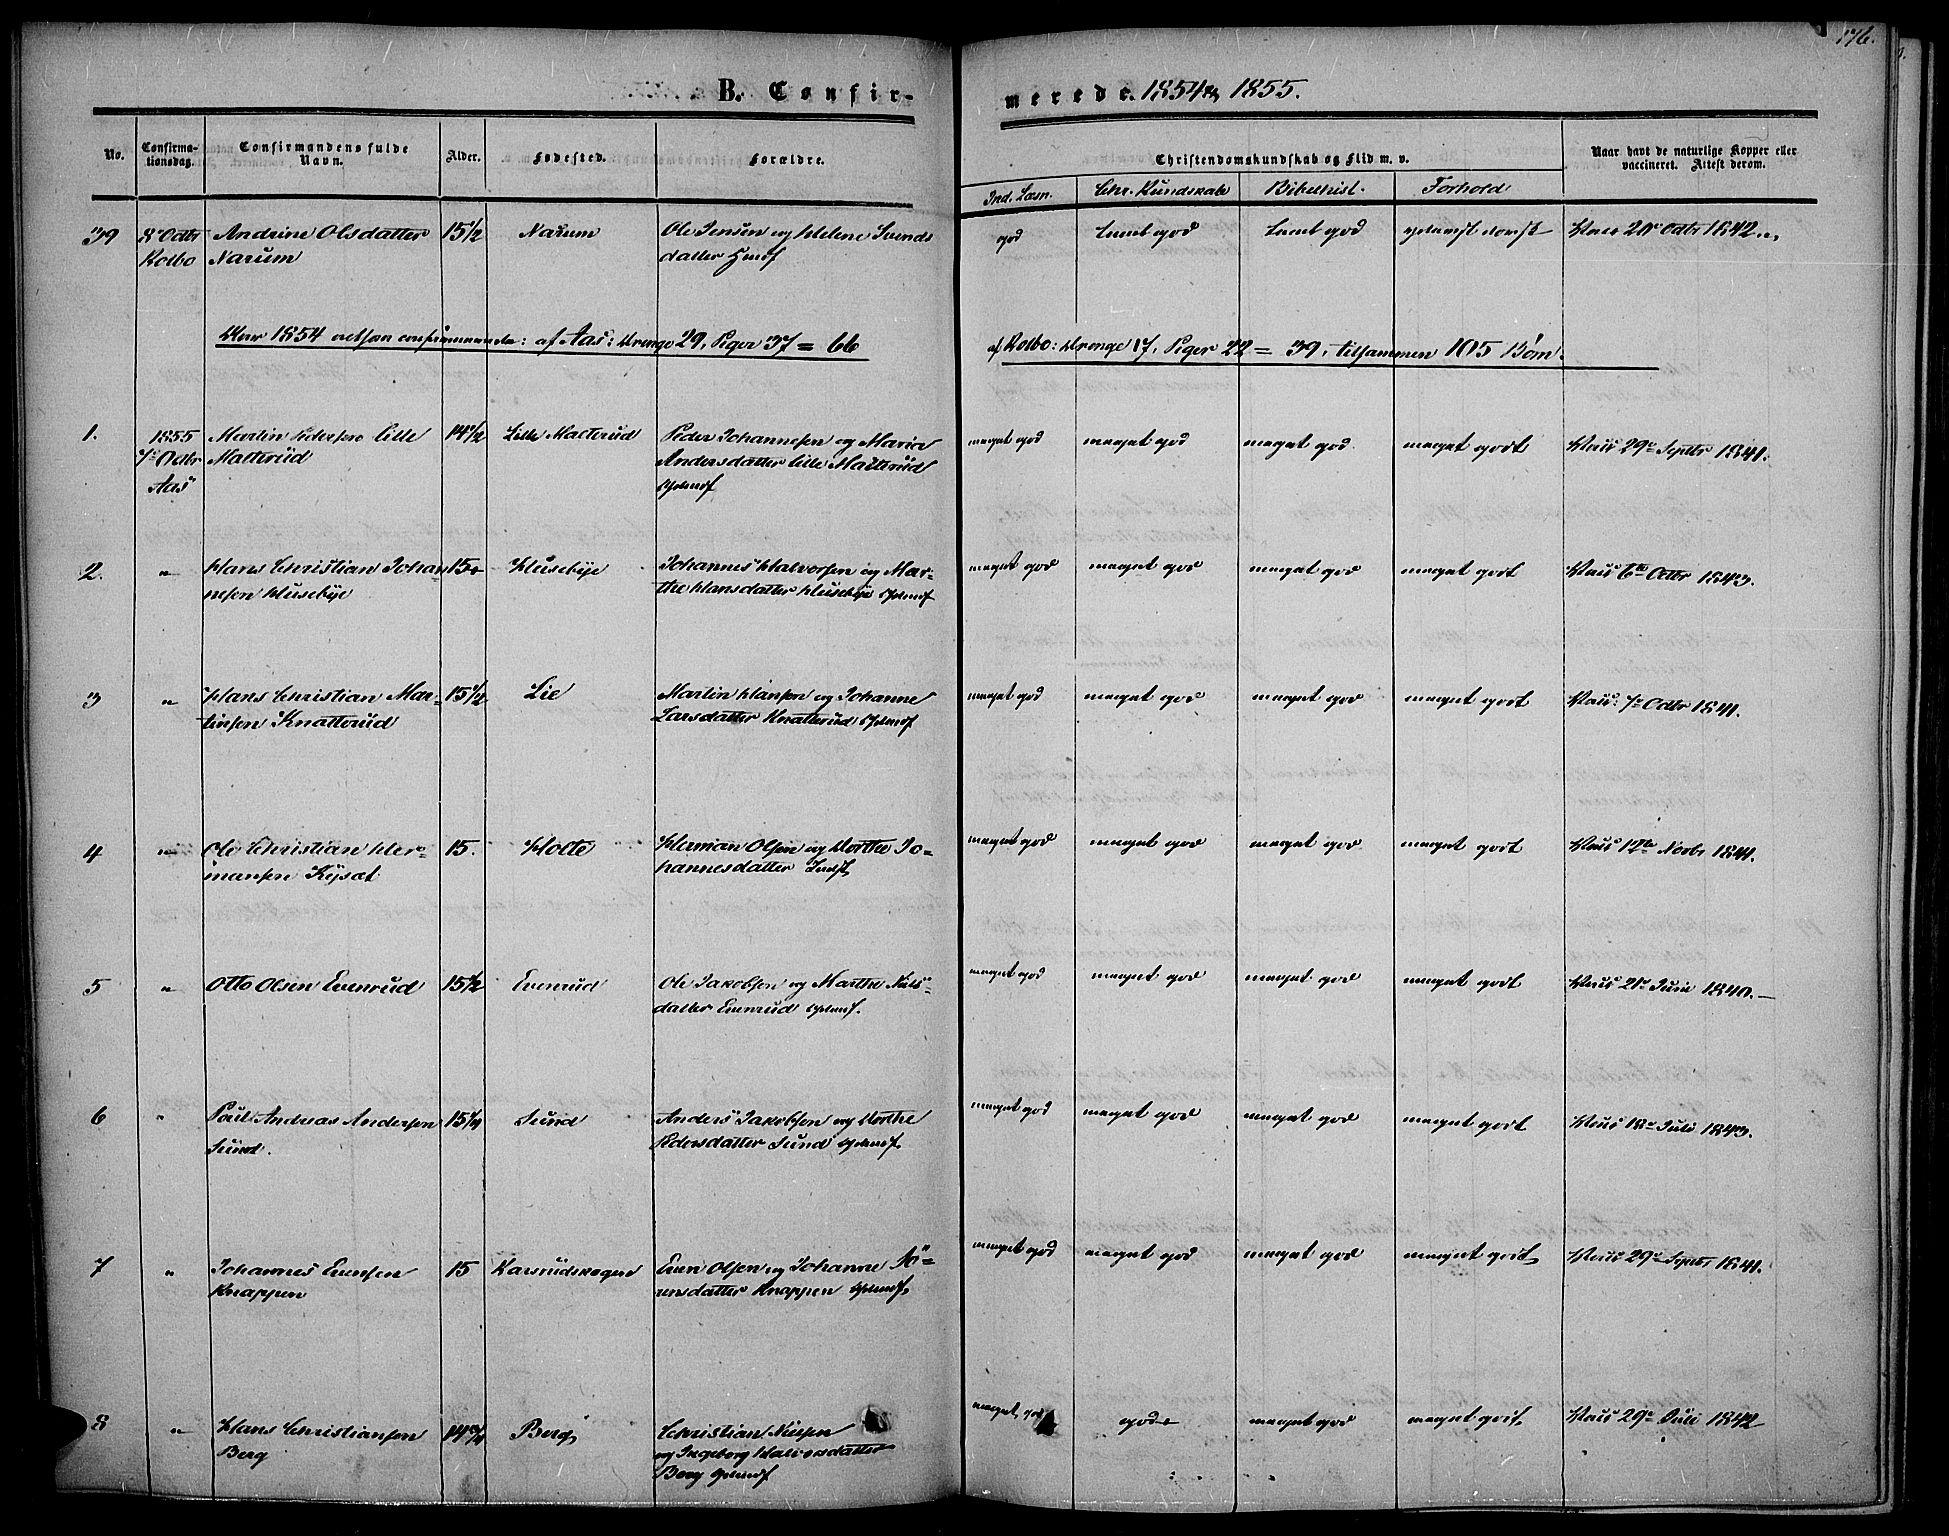 SAH, Vestre Toten prestekontor, H/Ha/Haa/L0005: Ministerialbok nr. 5, 1850-1855, s. 176